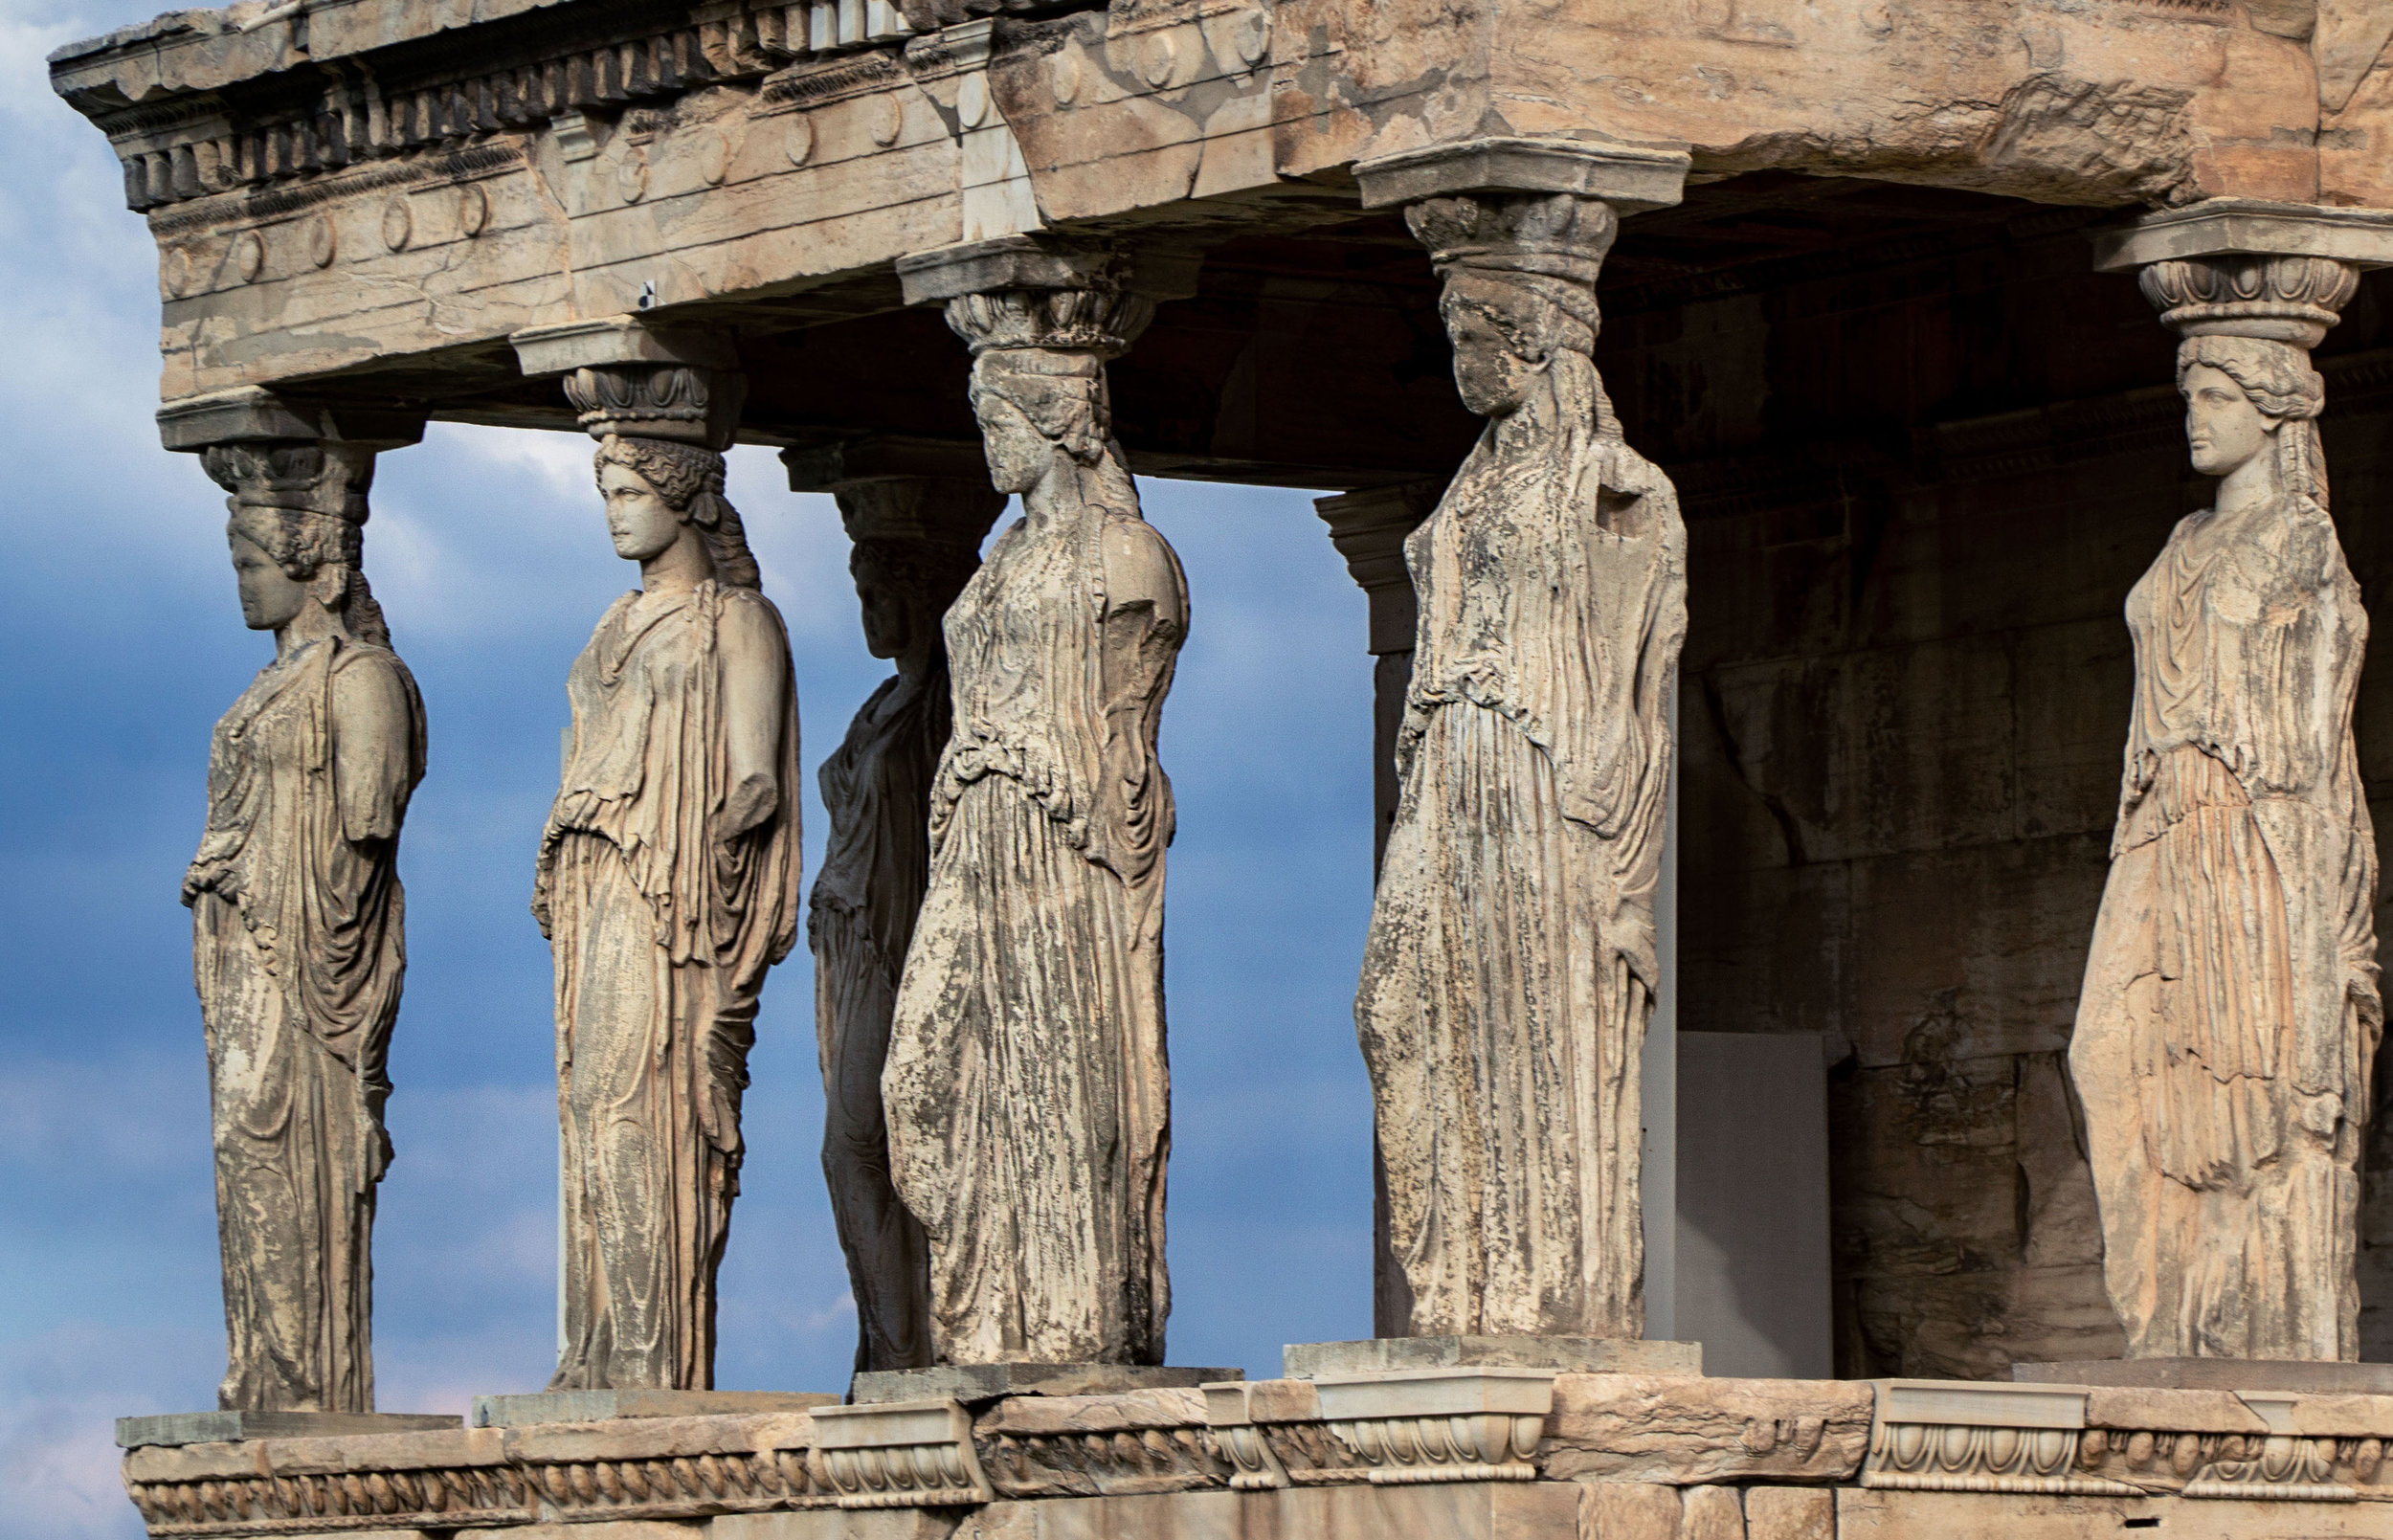 athens_acropolis_vickygood_travel_photography3sm.jpg